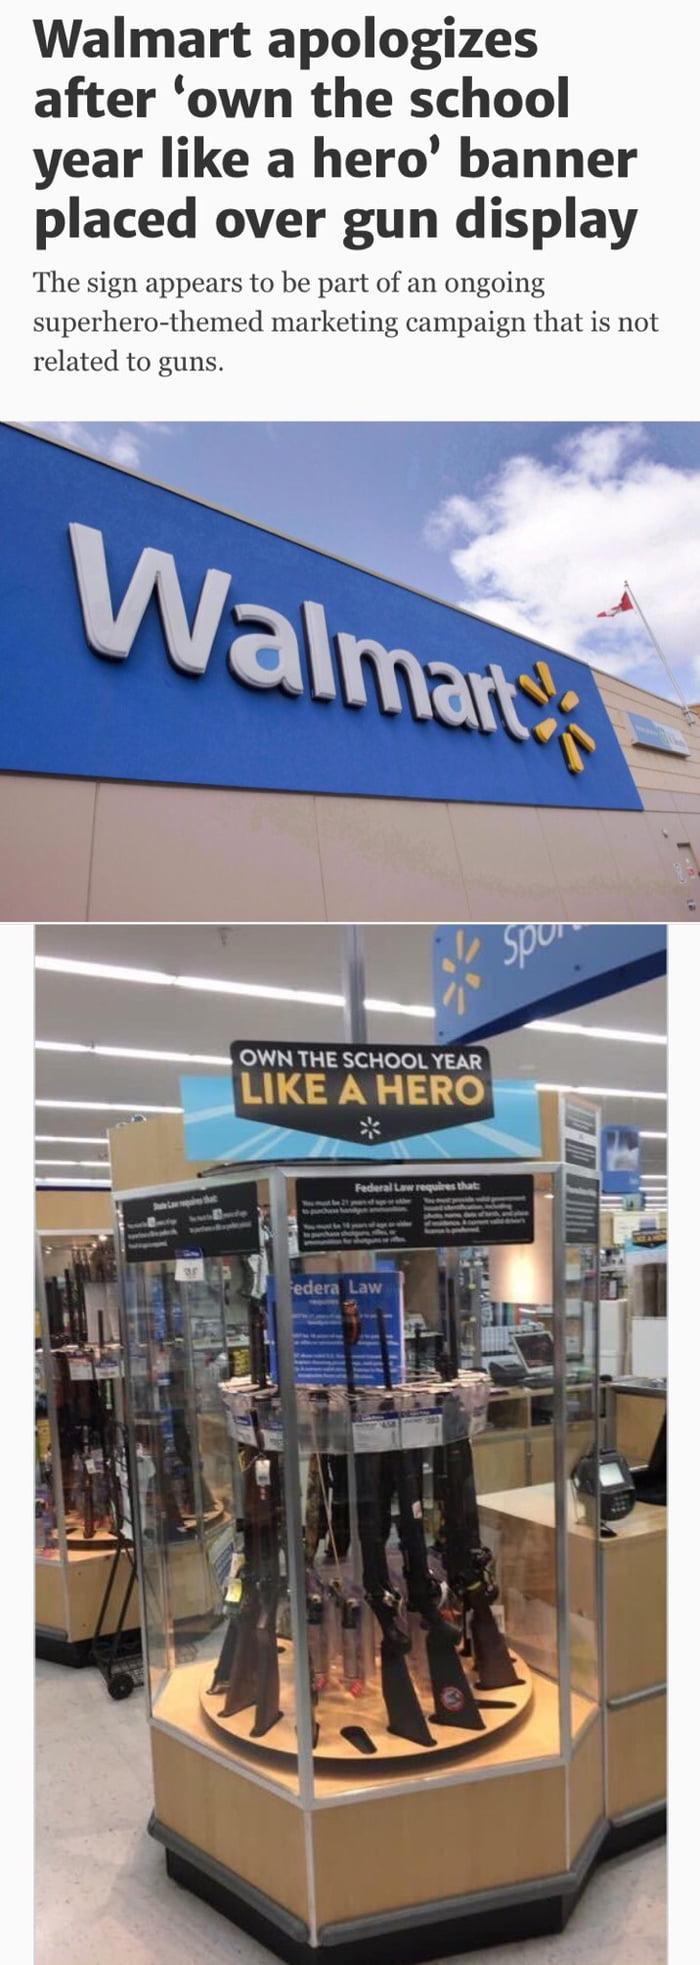 Oh! Walmart